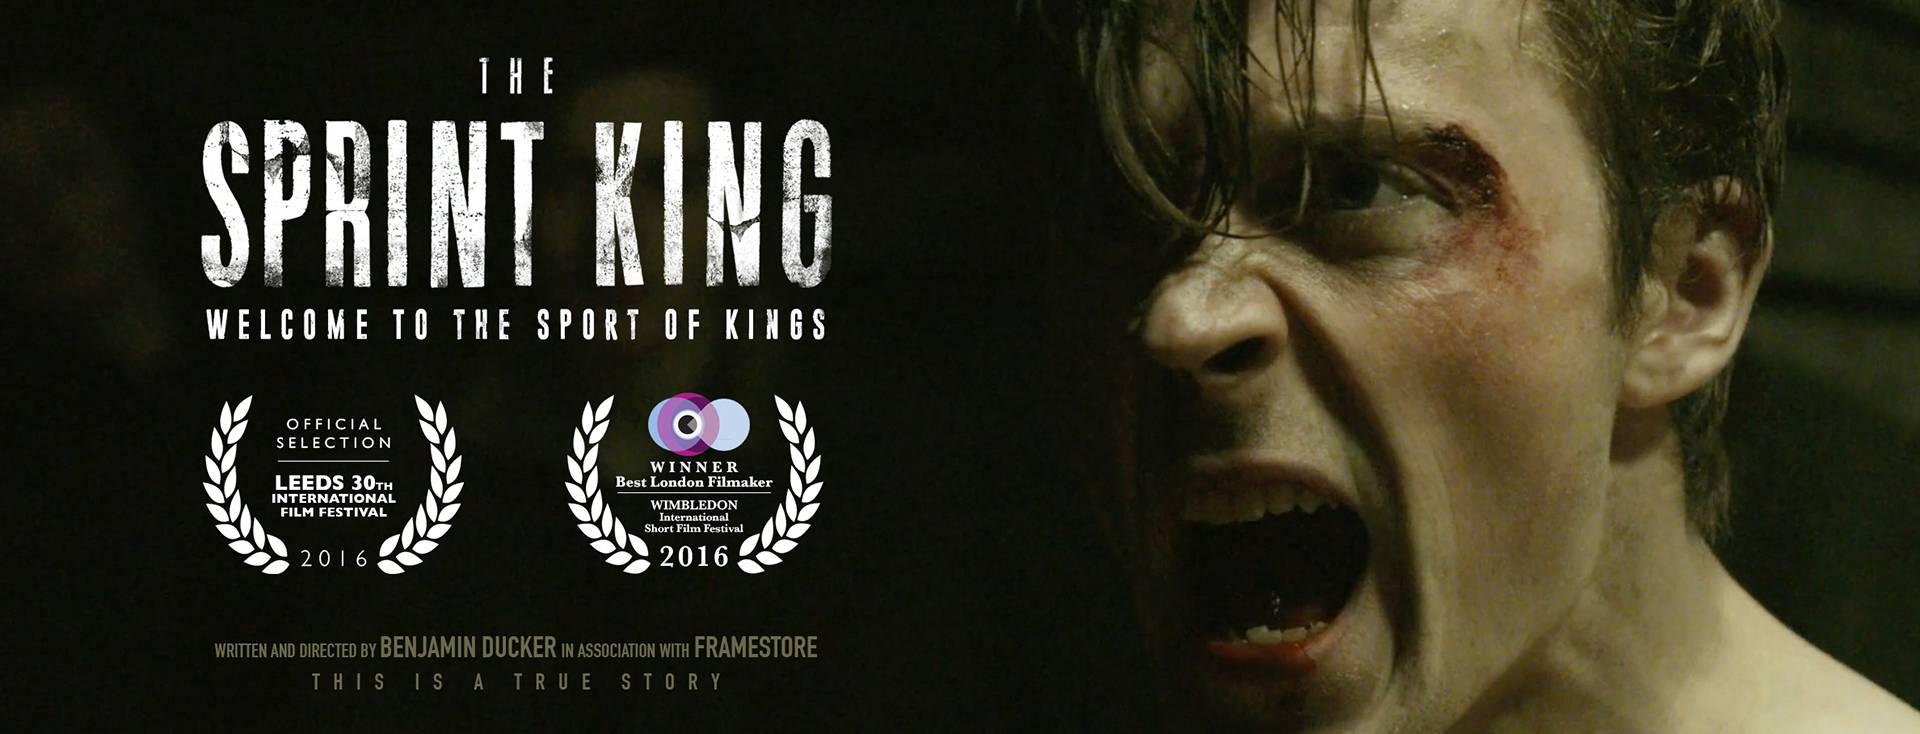 The Sprint King Short Film